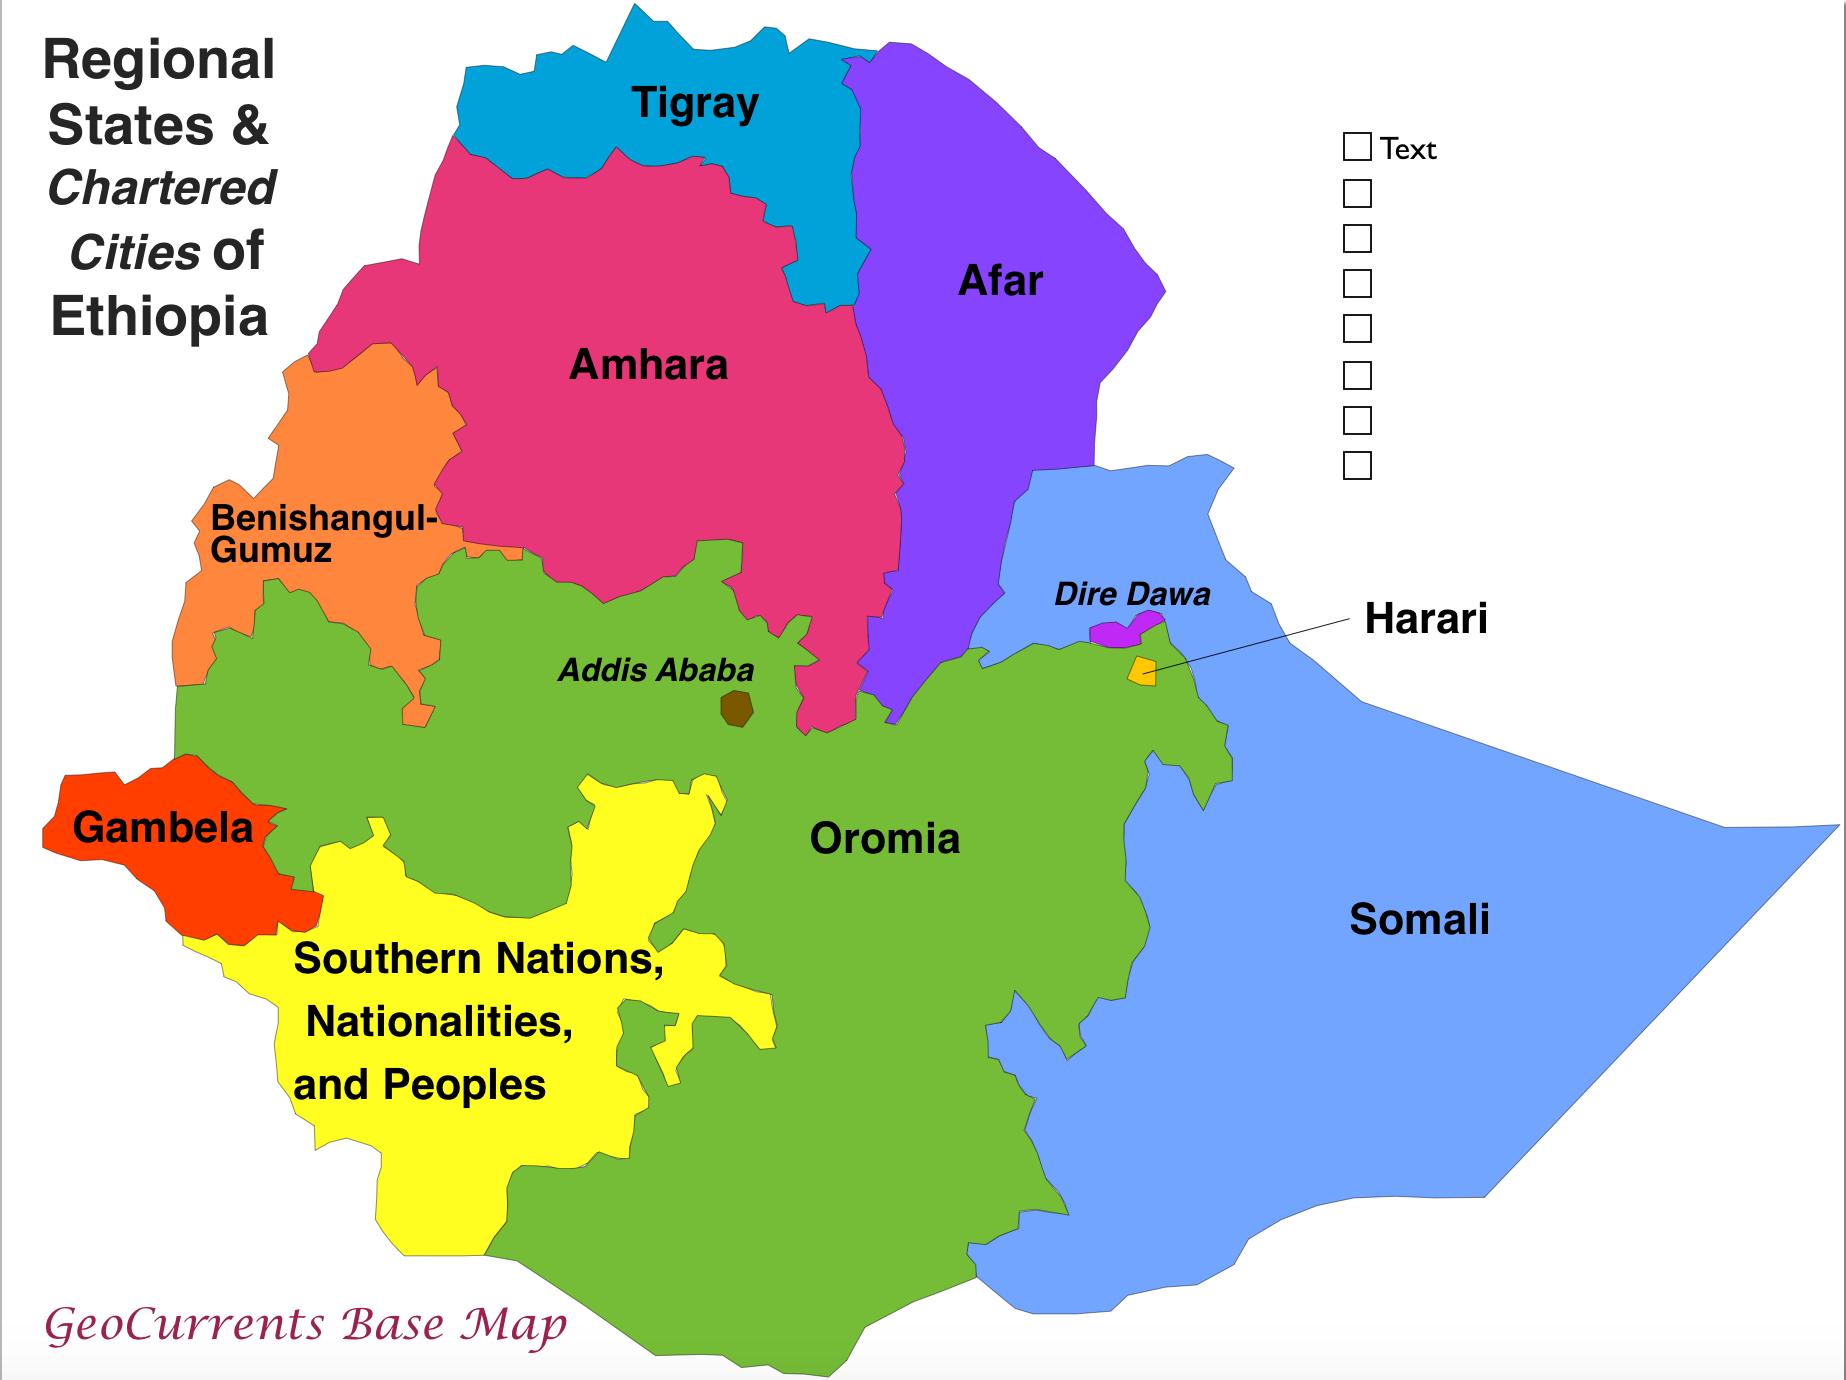 GeoCurrents Maps of Ethiopia | GeoCurrents